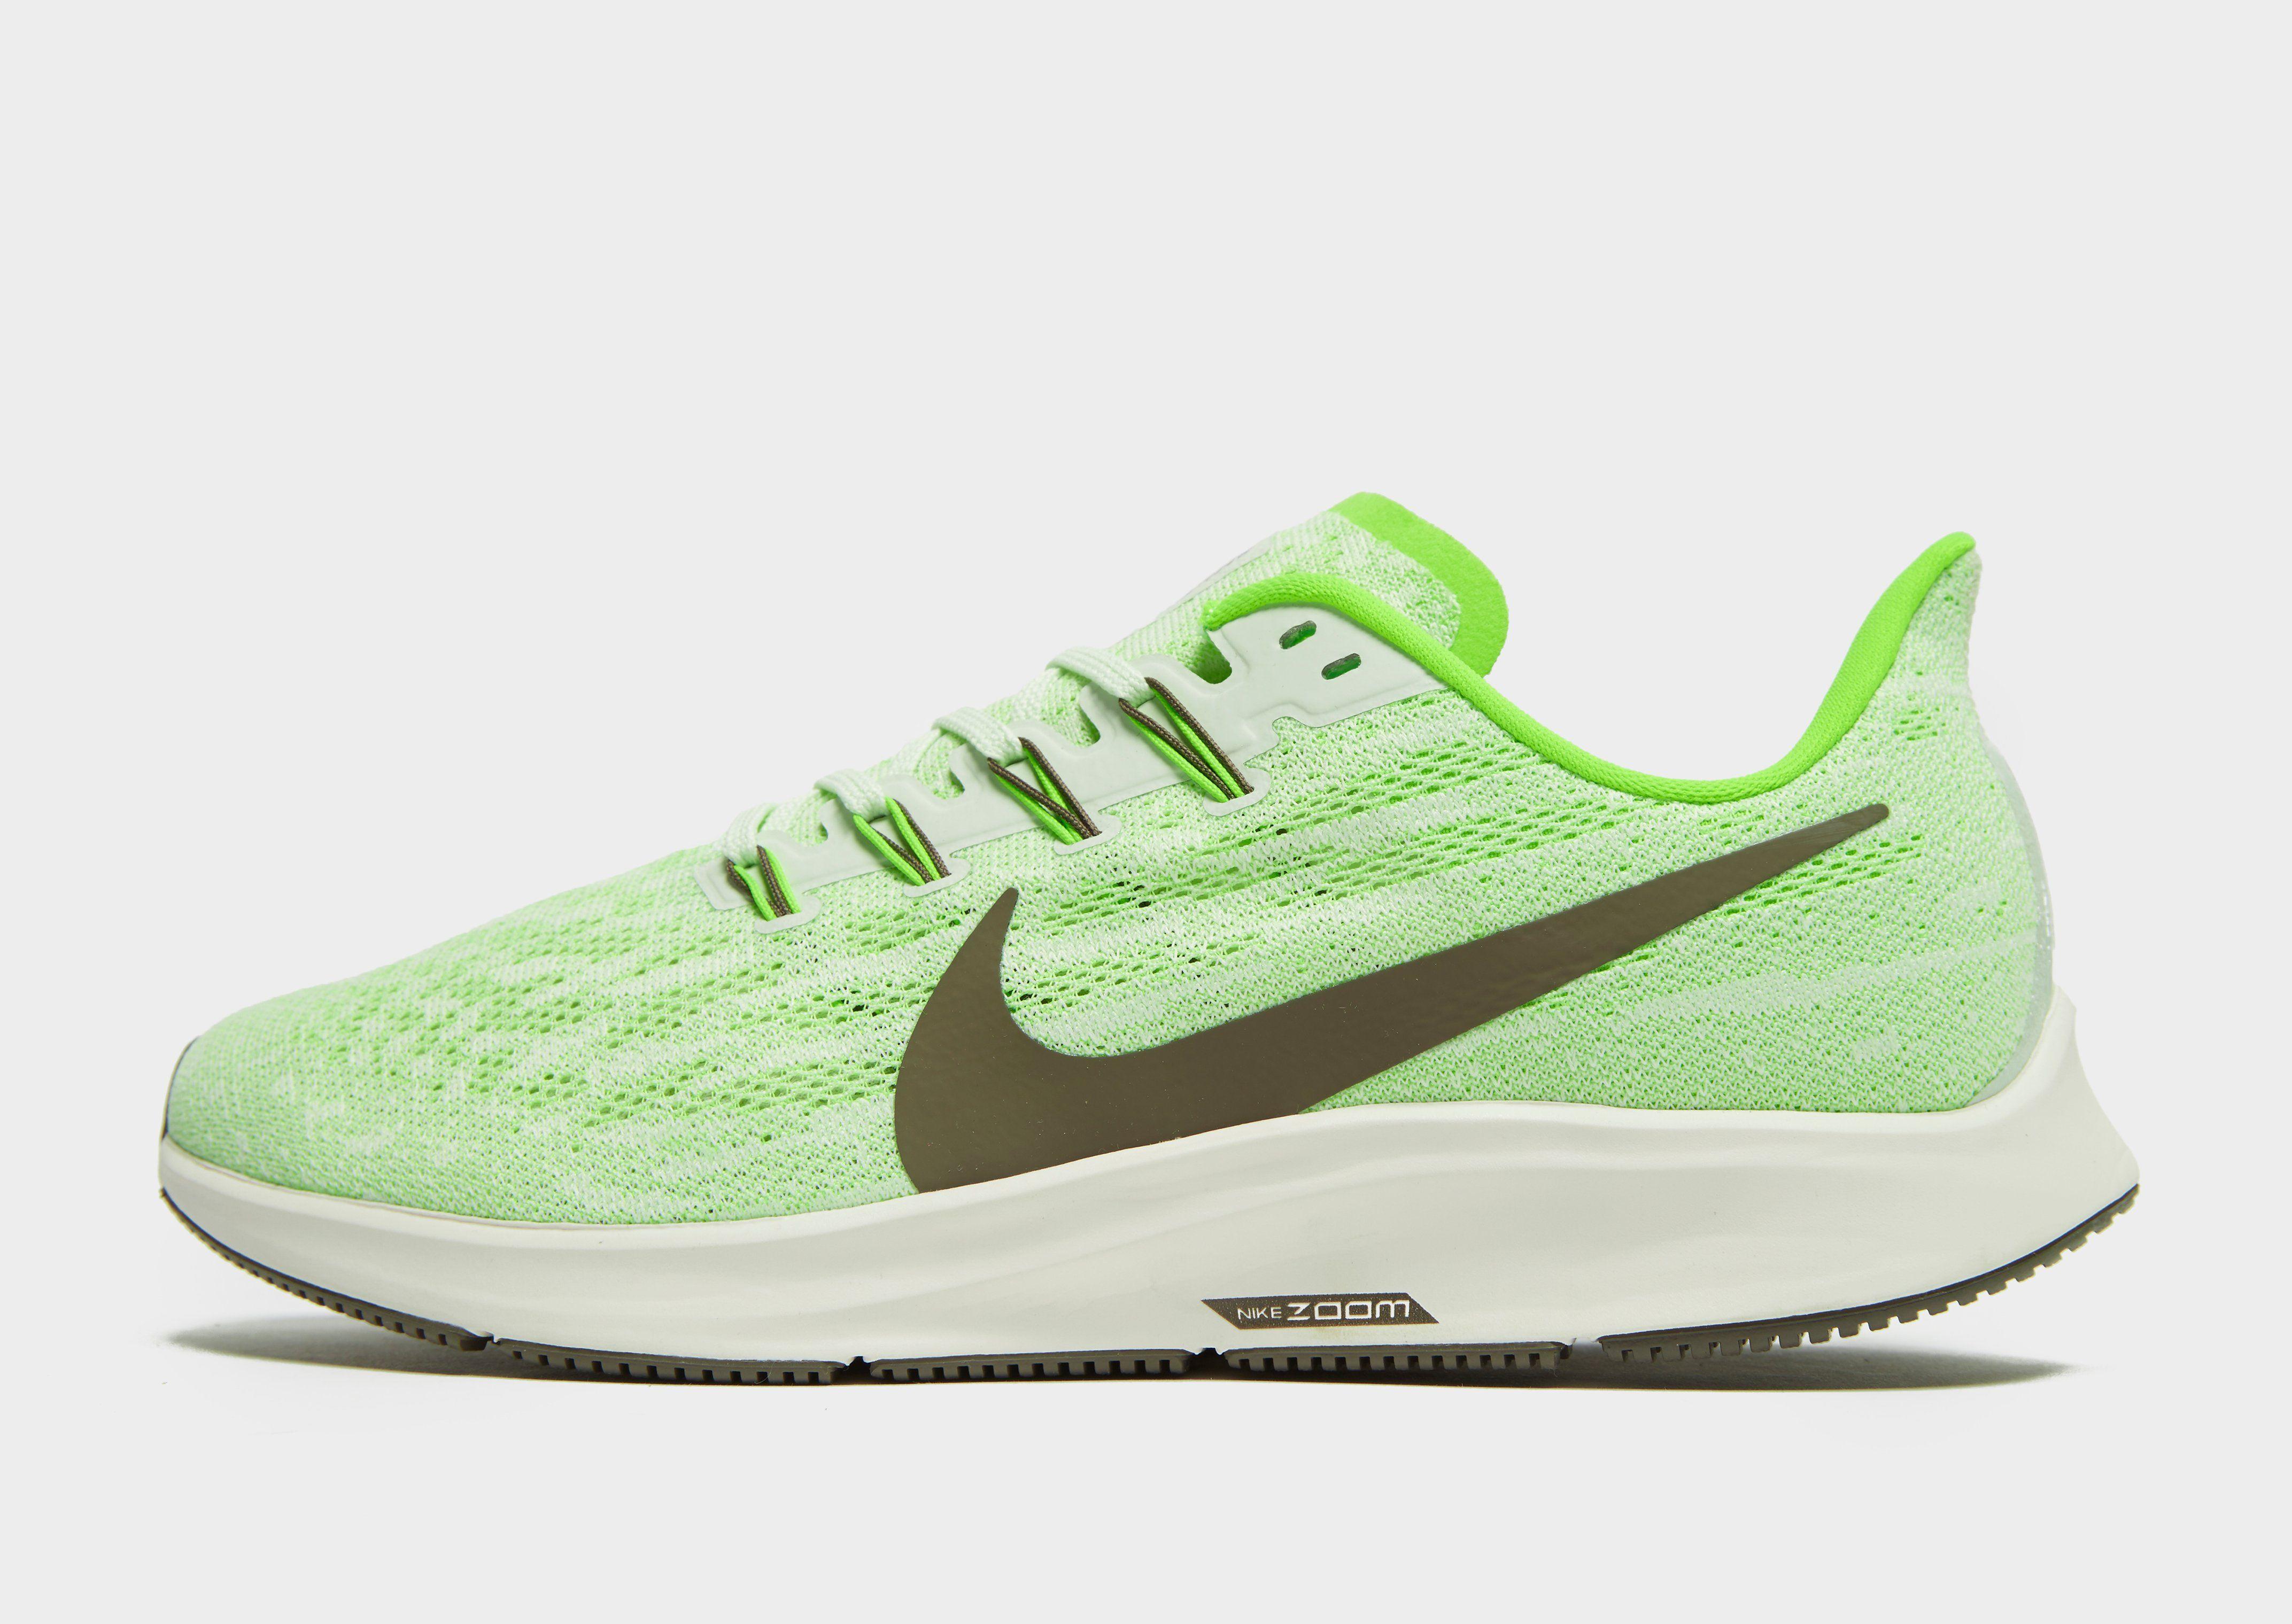 la moitié f0386 874a2 Nike Nike Air Zoom Pegasus 36 Men's Running Shoe | JD Sports